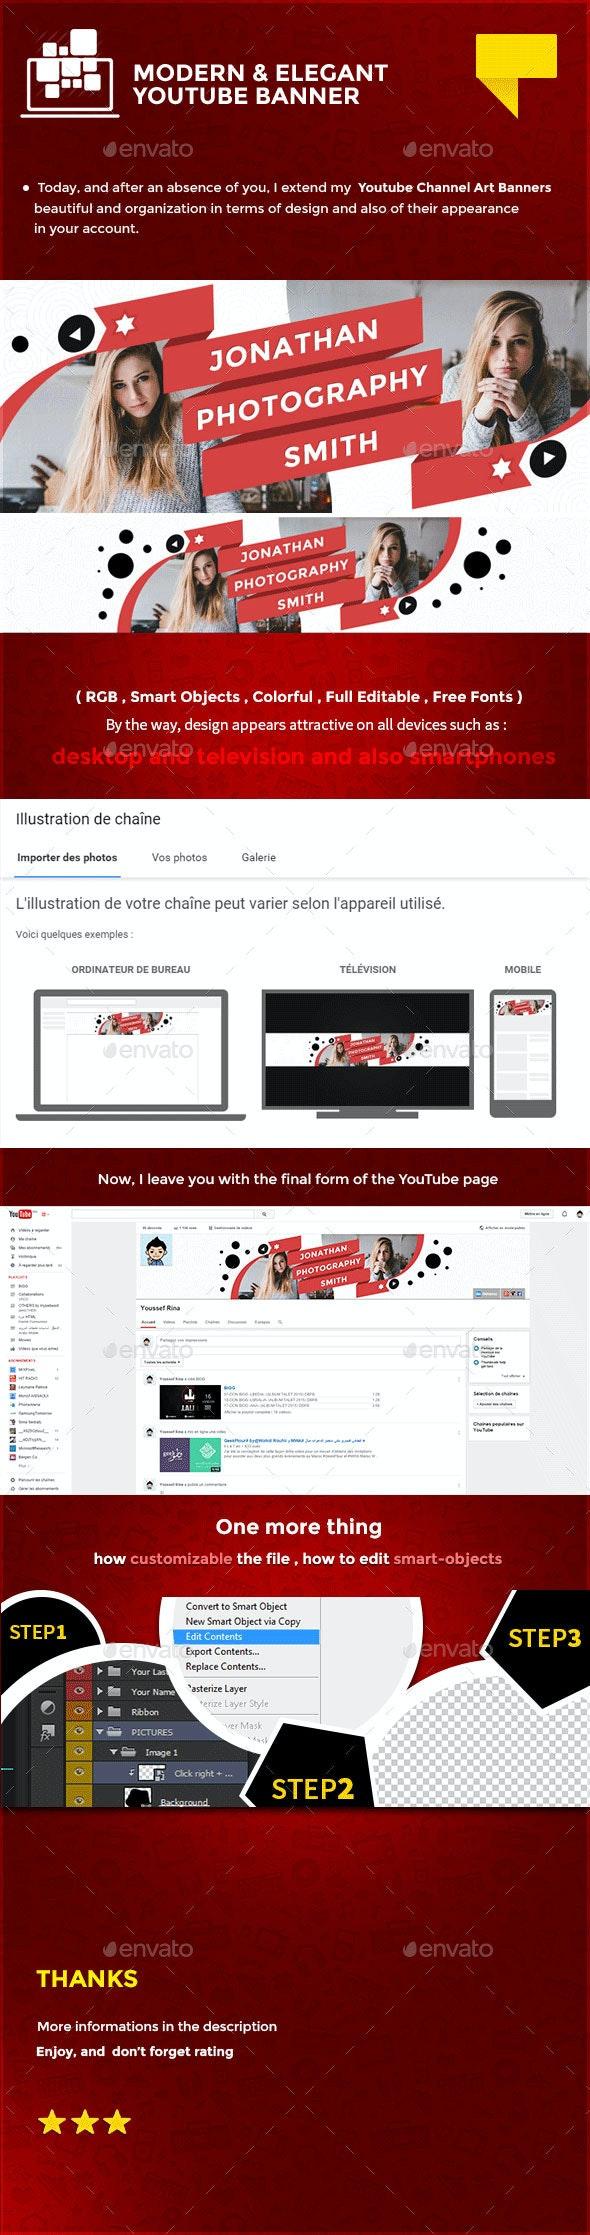 Creative Youtube Banner - YouTube Social Media